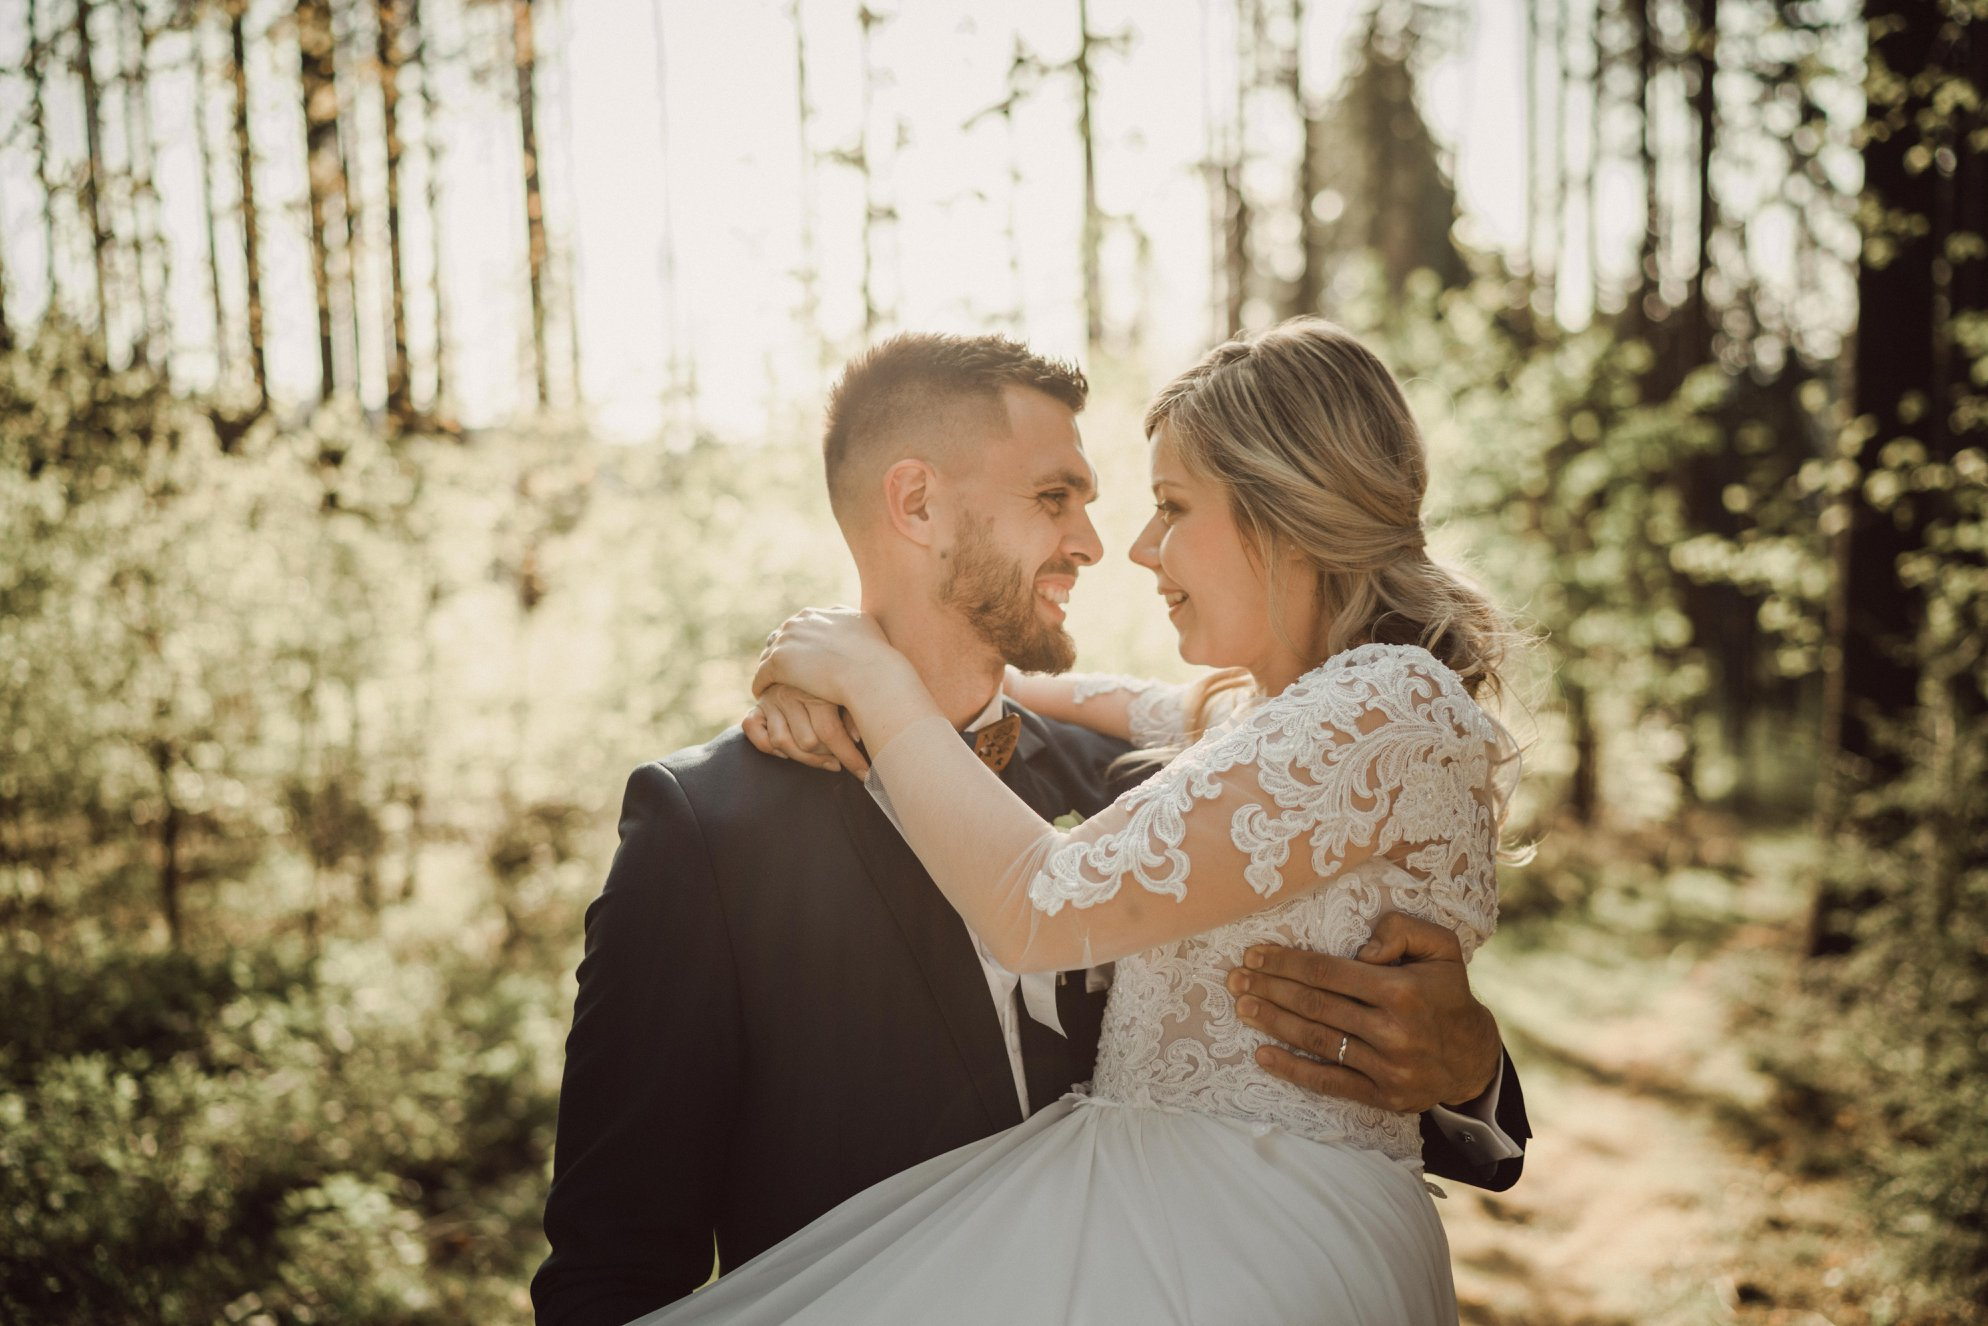 fotenie-svadbyjpg